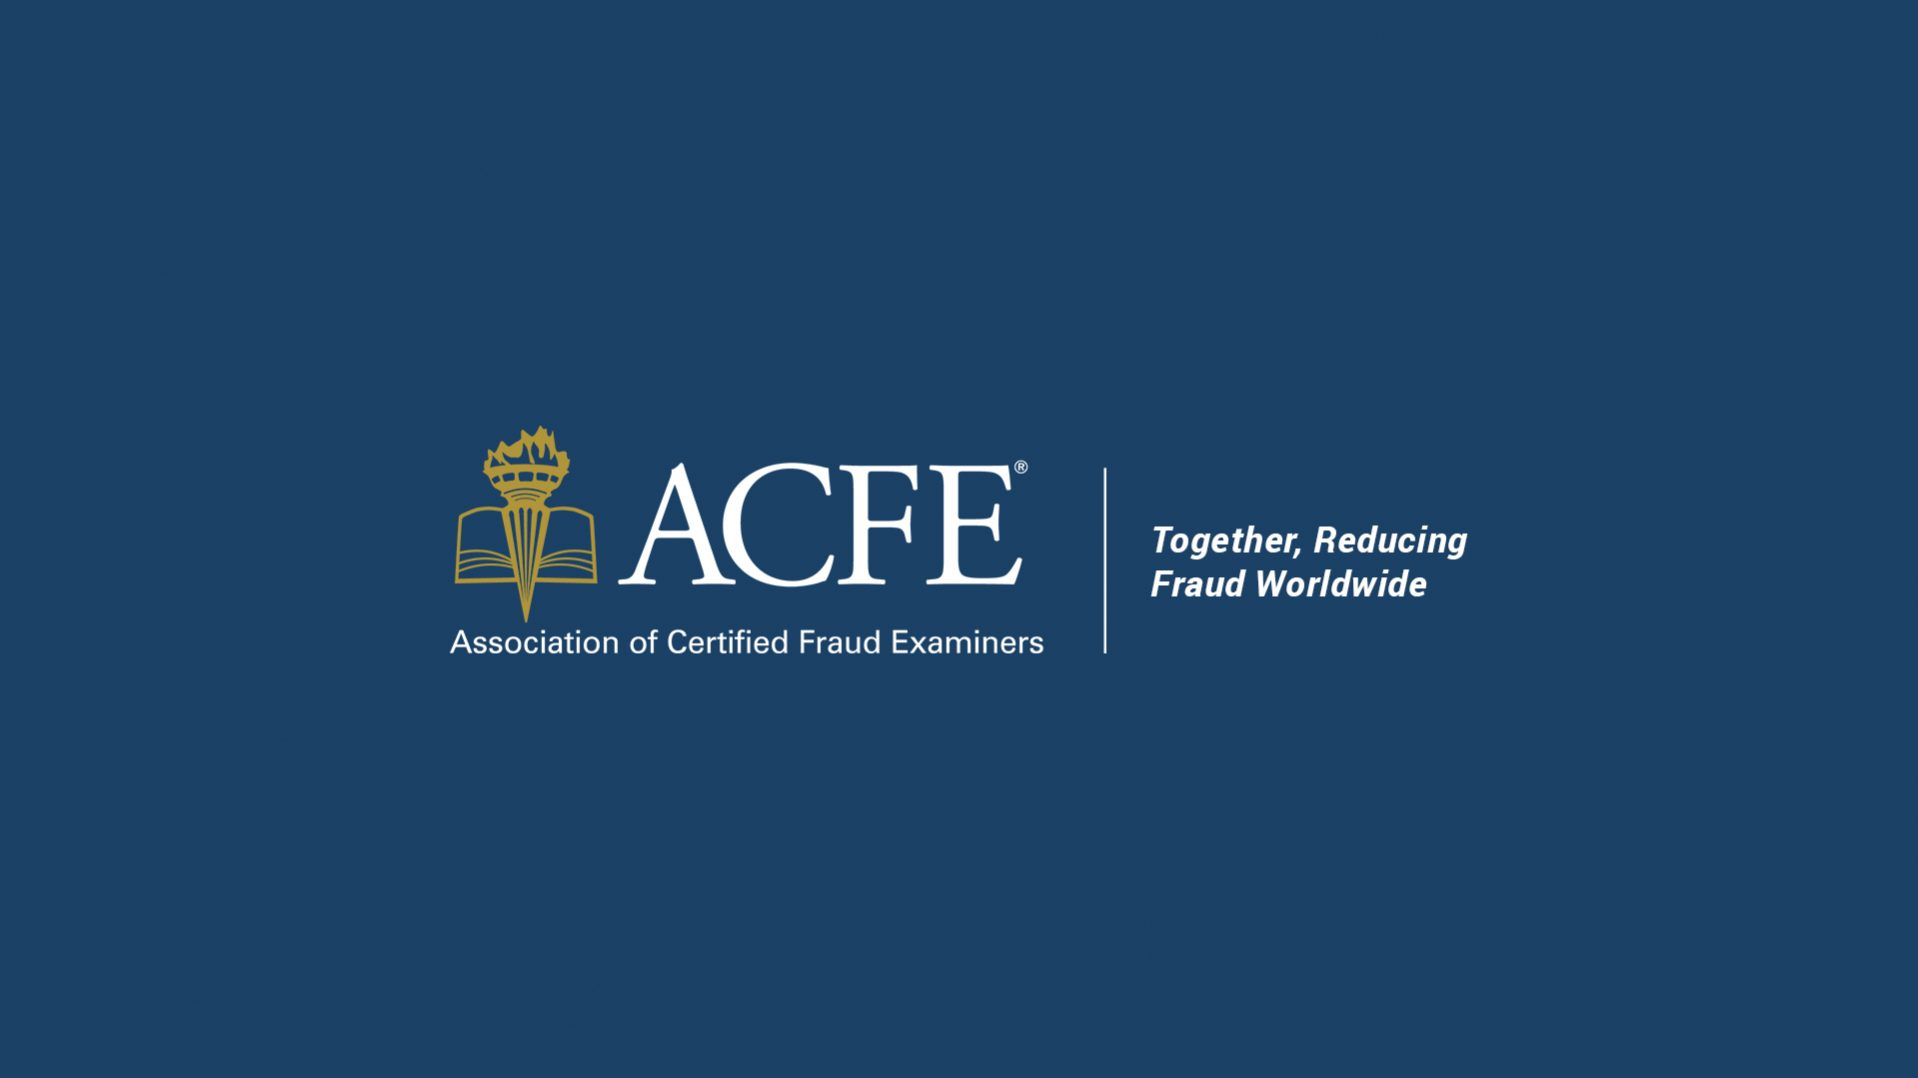 acfe-banner